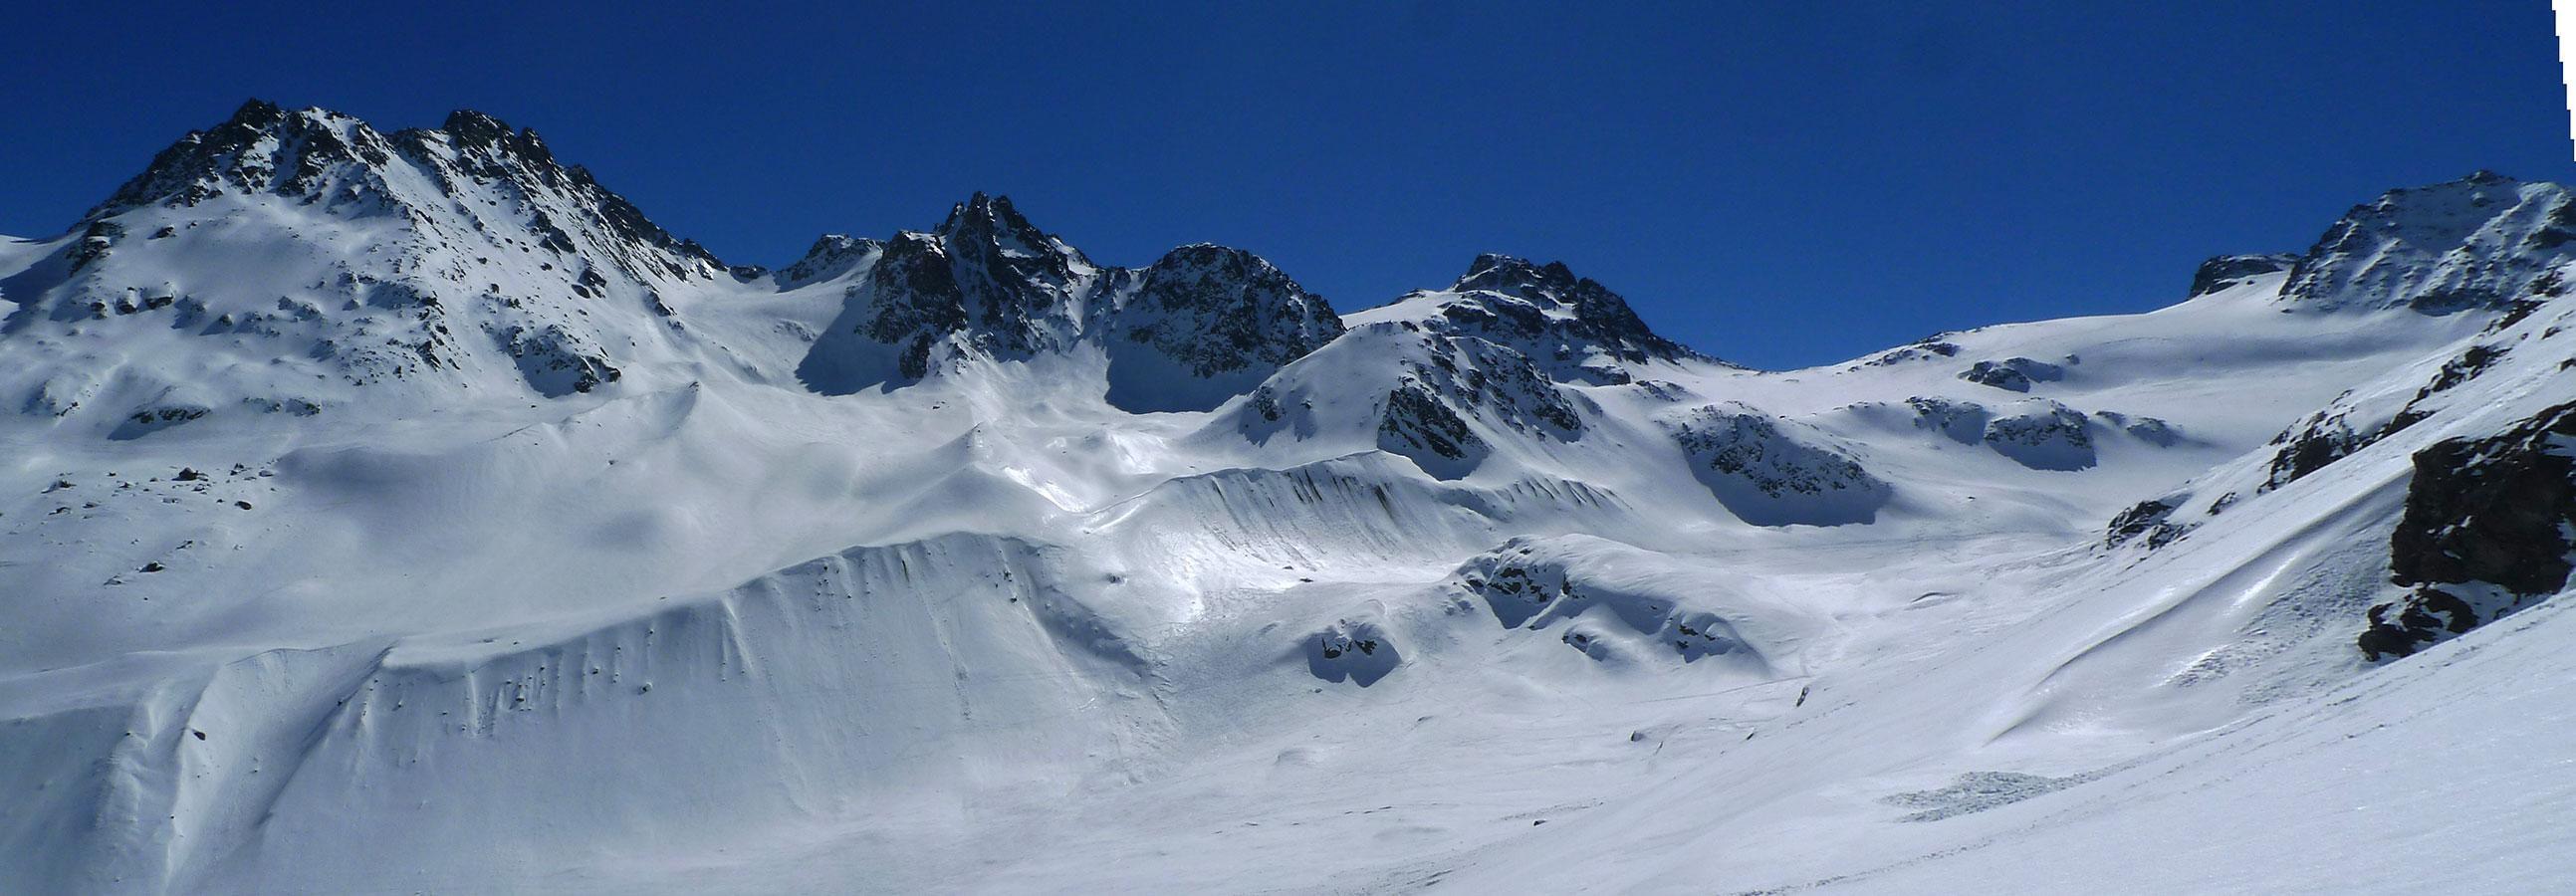 Haagspitze East (Jamtalhütte) Silvretta Rakousko panorama 34